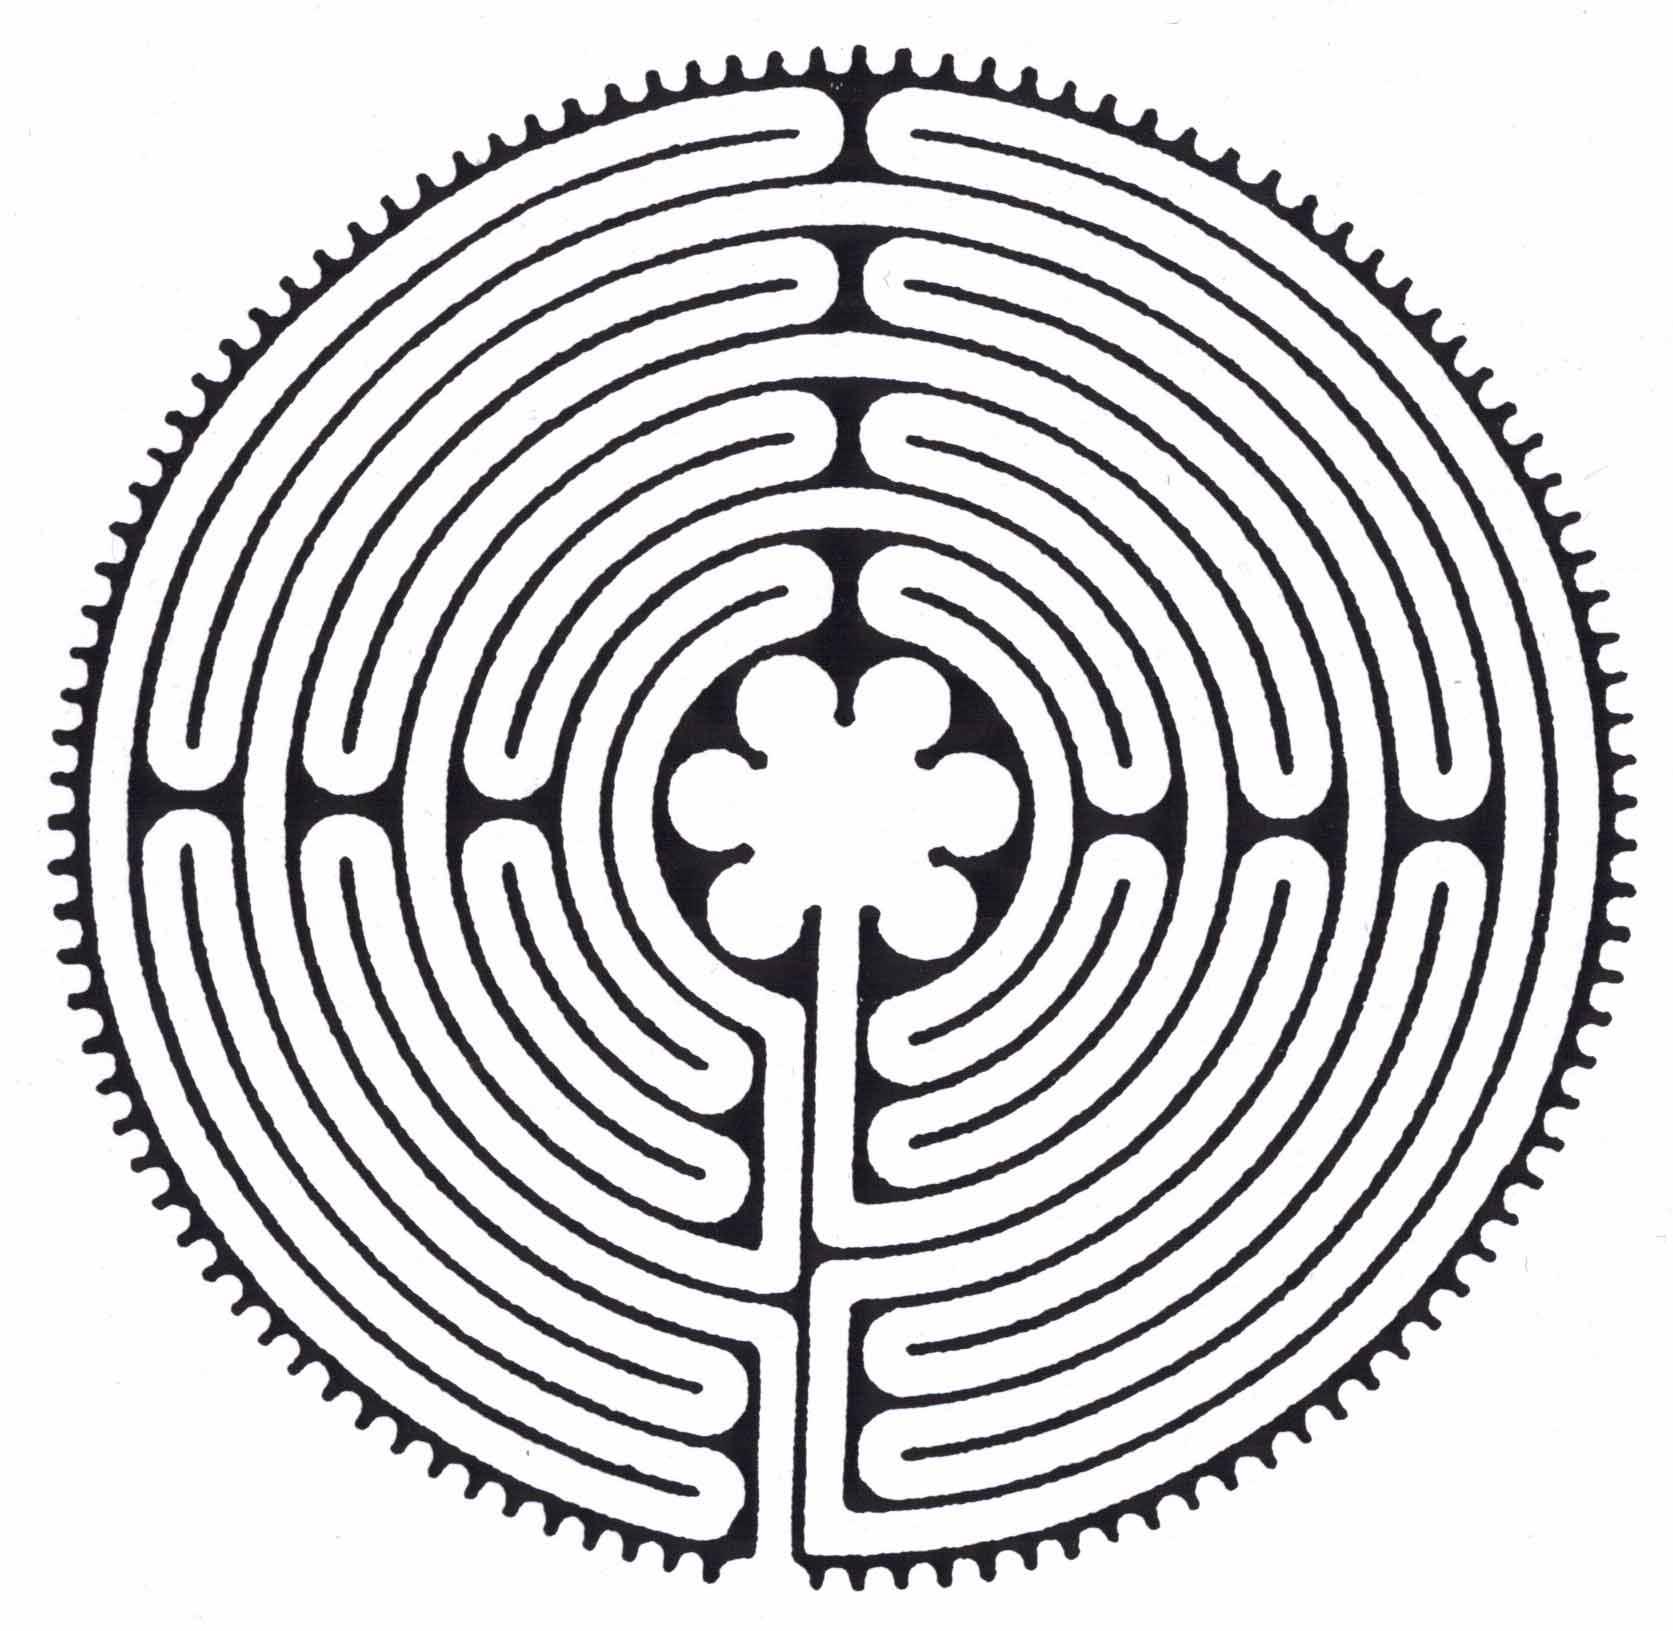 https://johnfisk.files.wordpress.com/2010/09/labyrinth.jpg